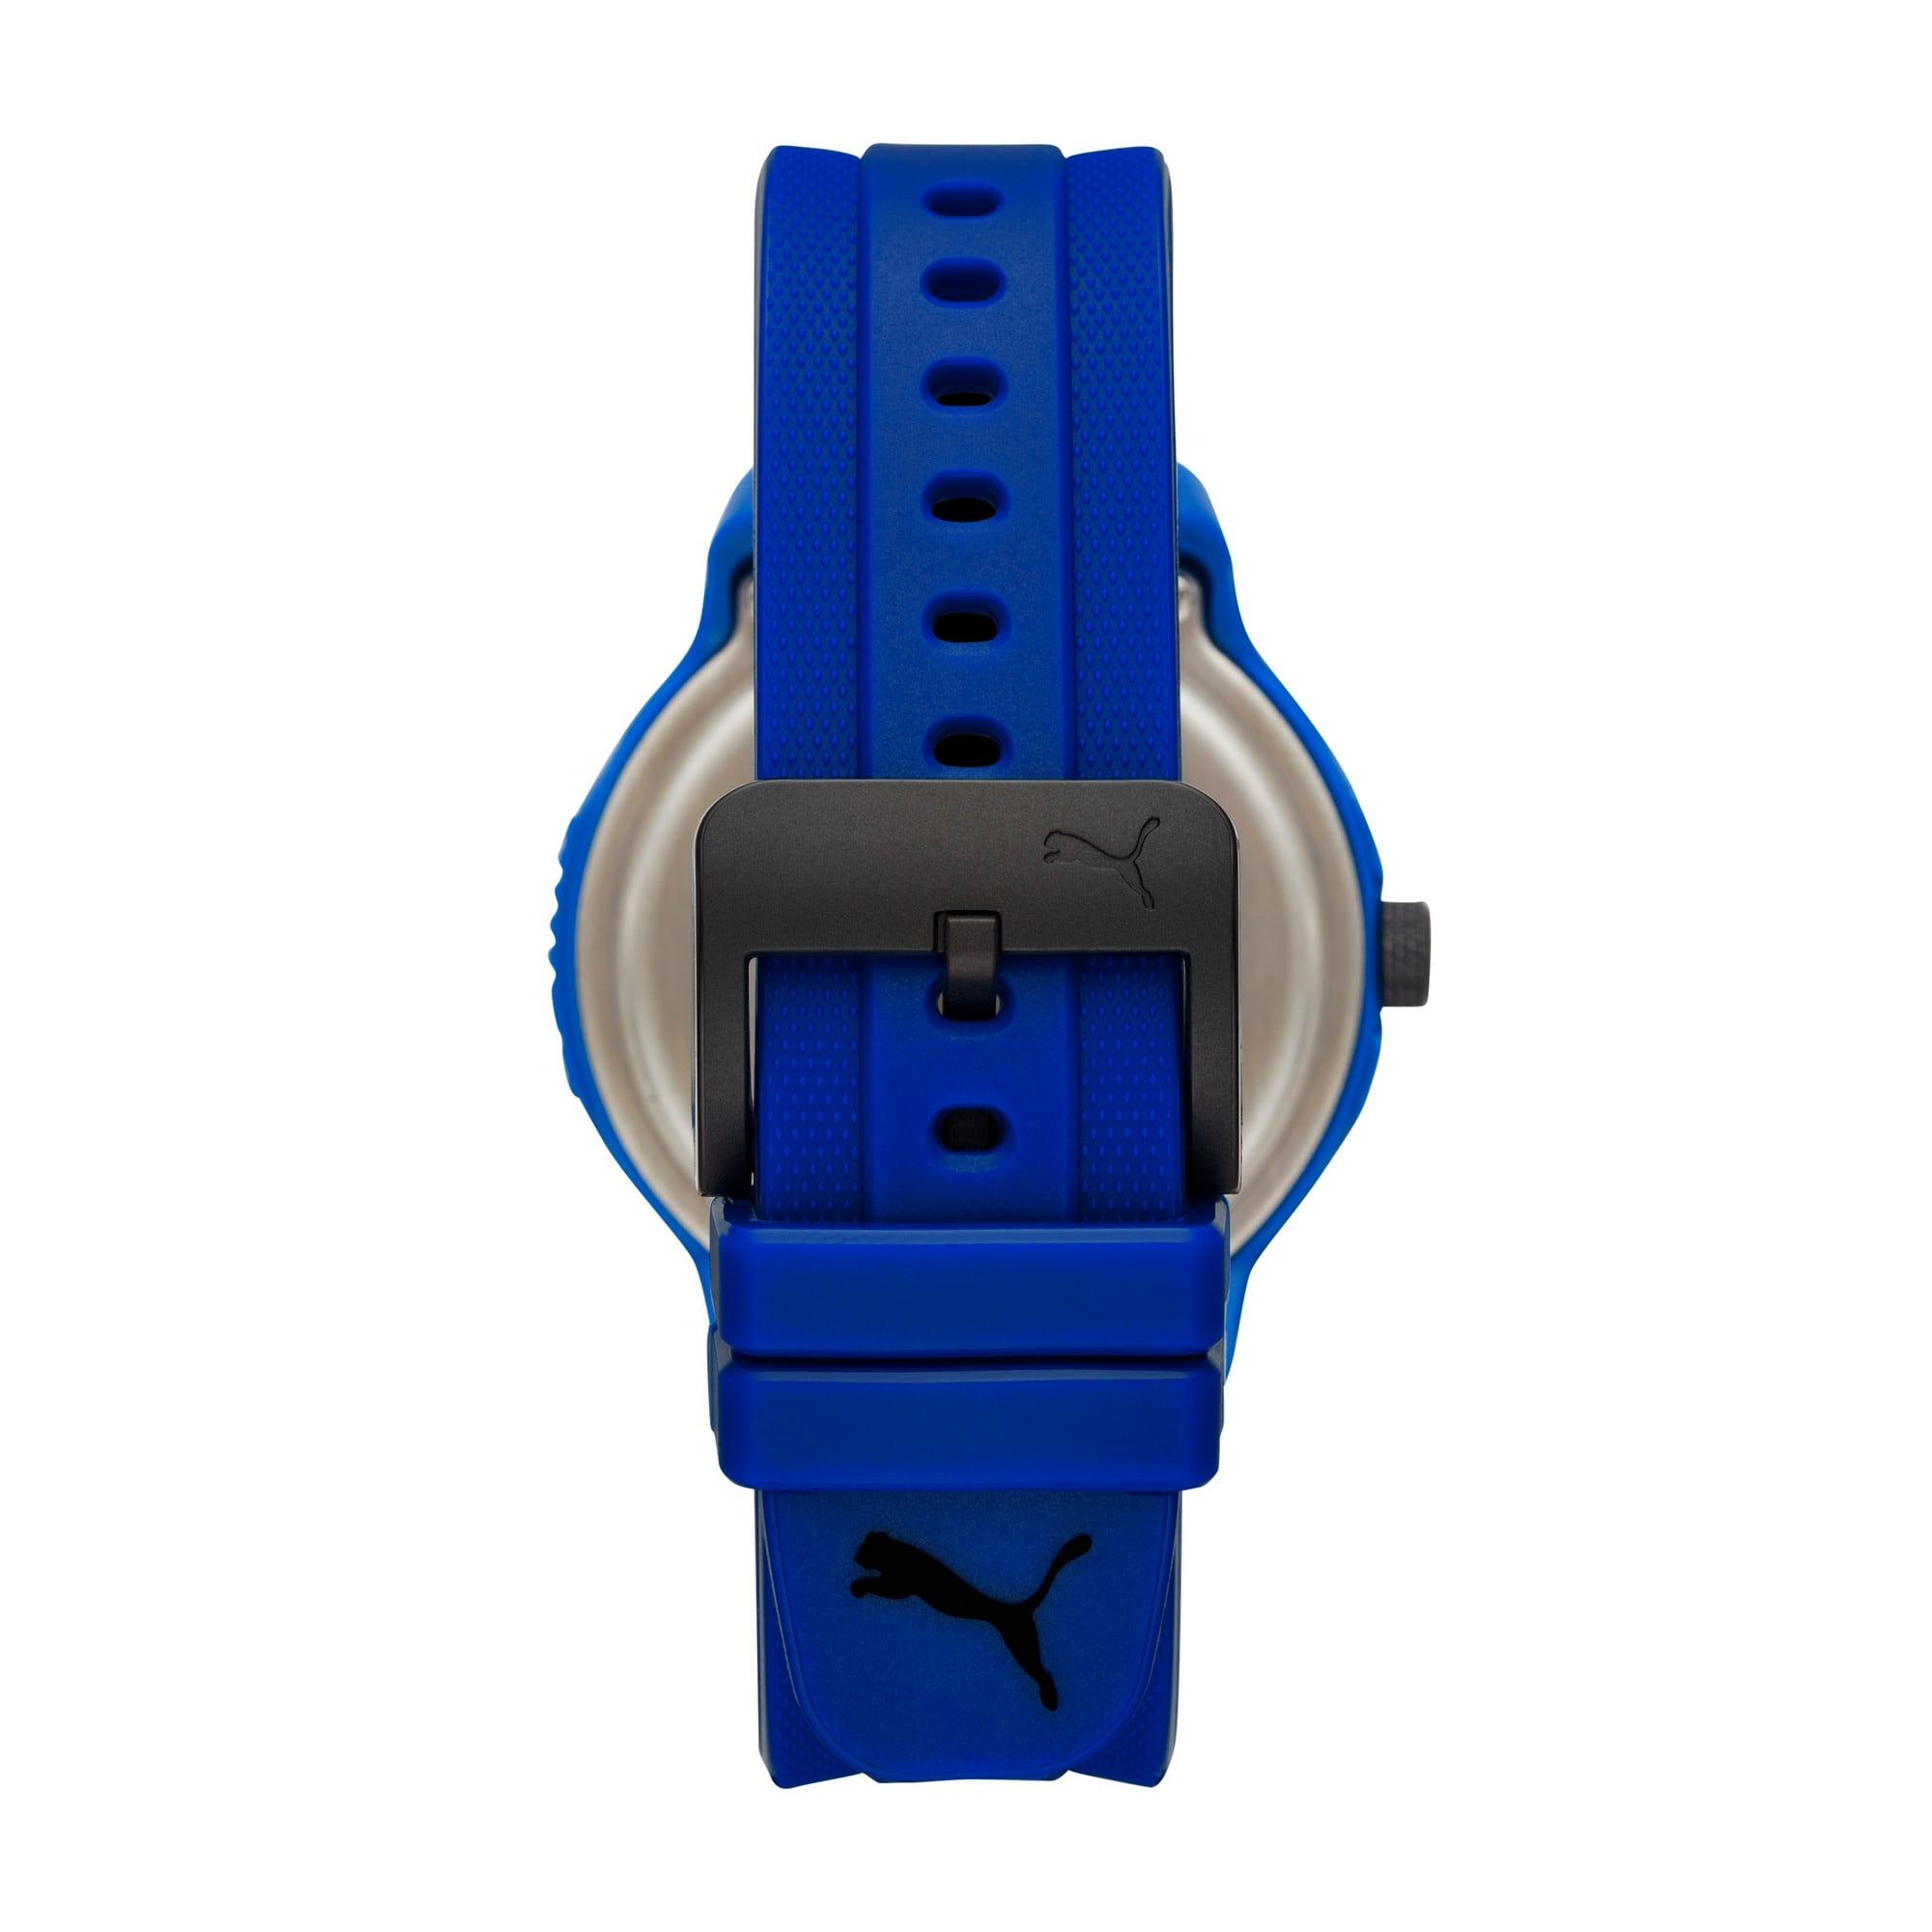 Thumbnail 2 of メンズ リセット ポリウレタン V2  時計, Blue/Blue, medium-JPN